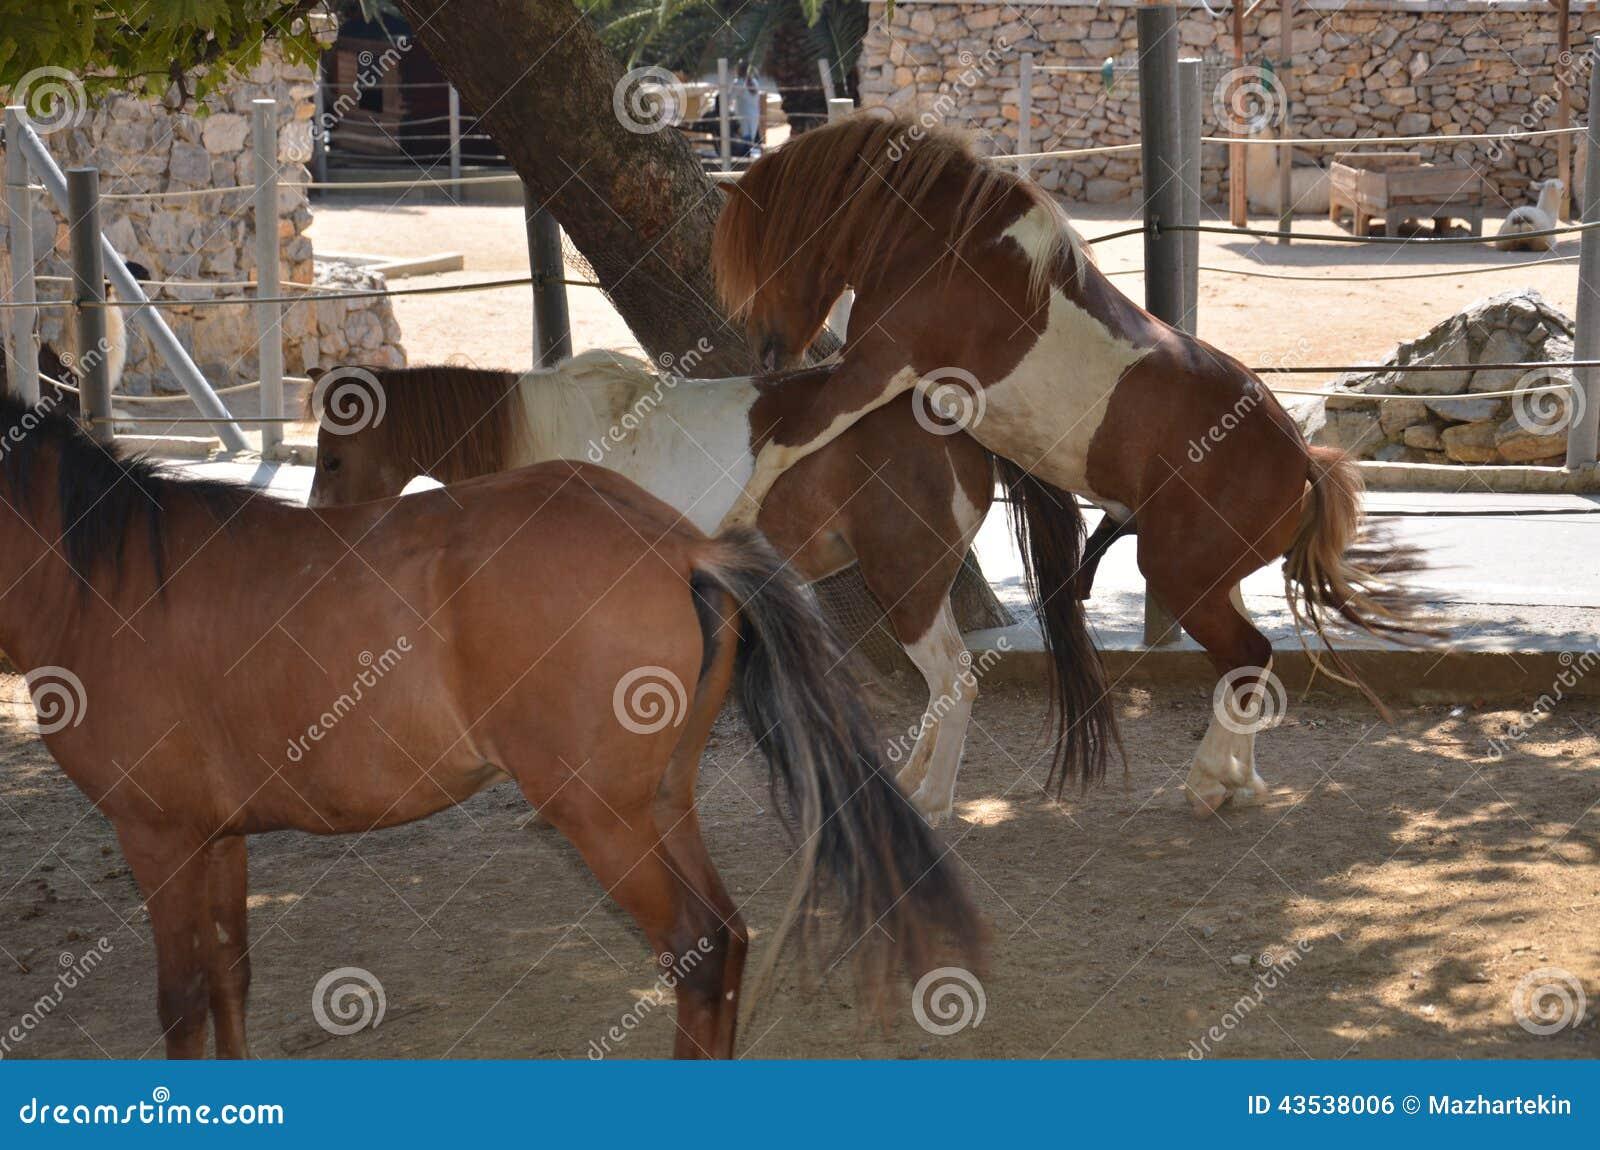 Horses mating season stock photo  Image of horses, darica